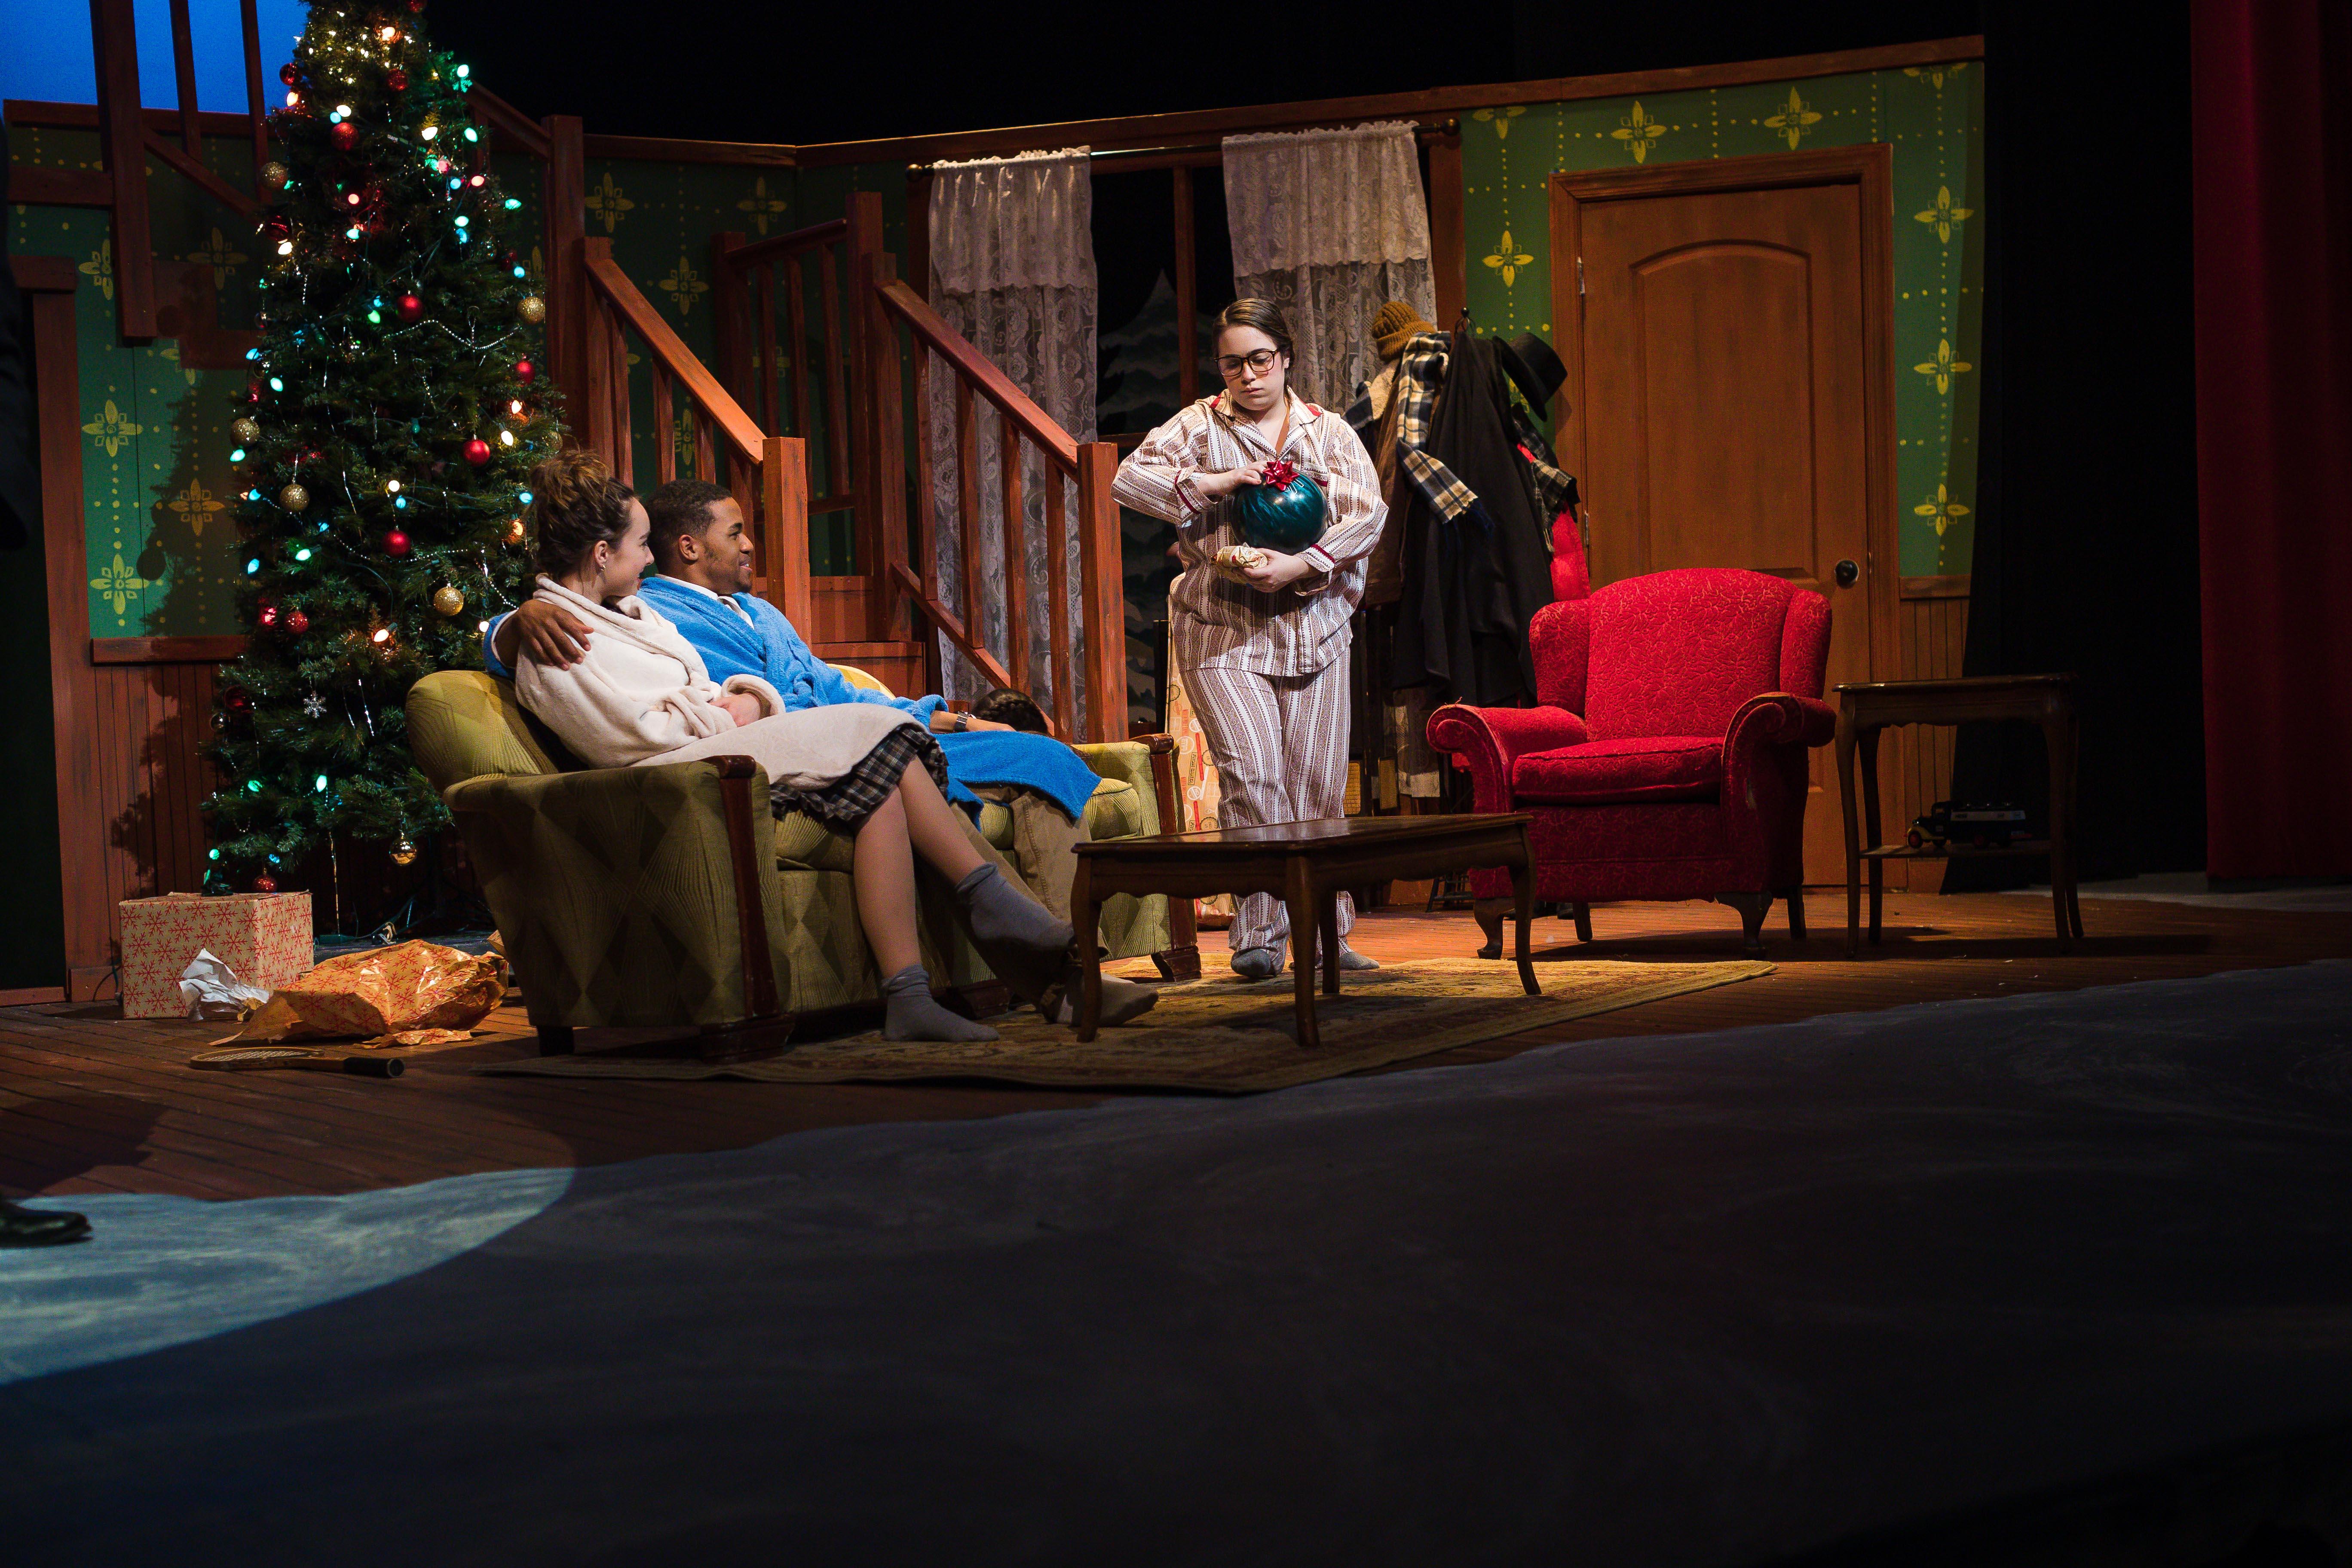 Weaver_Christmasshoot-_MG_1512